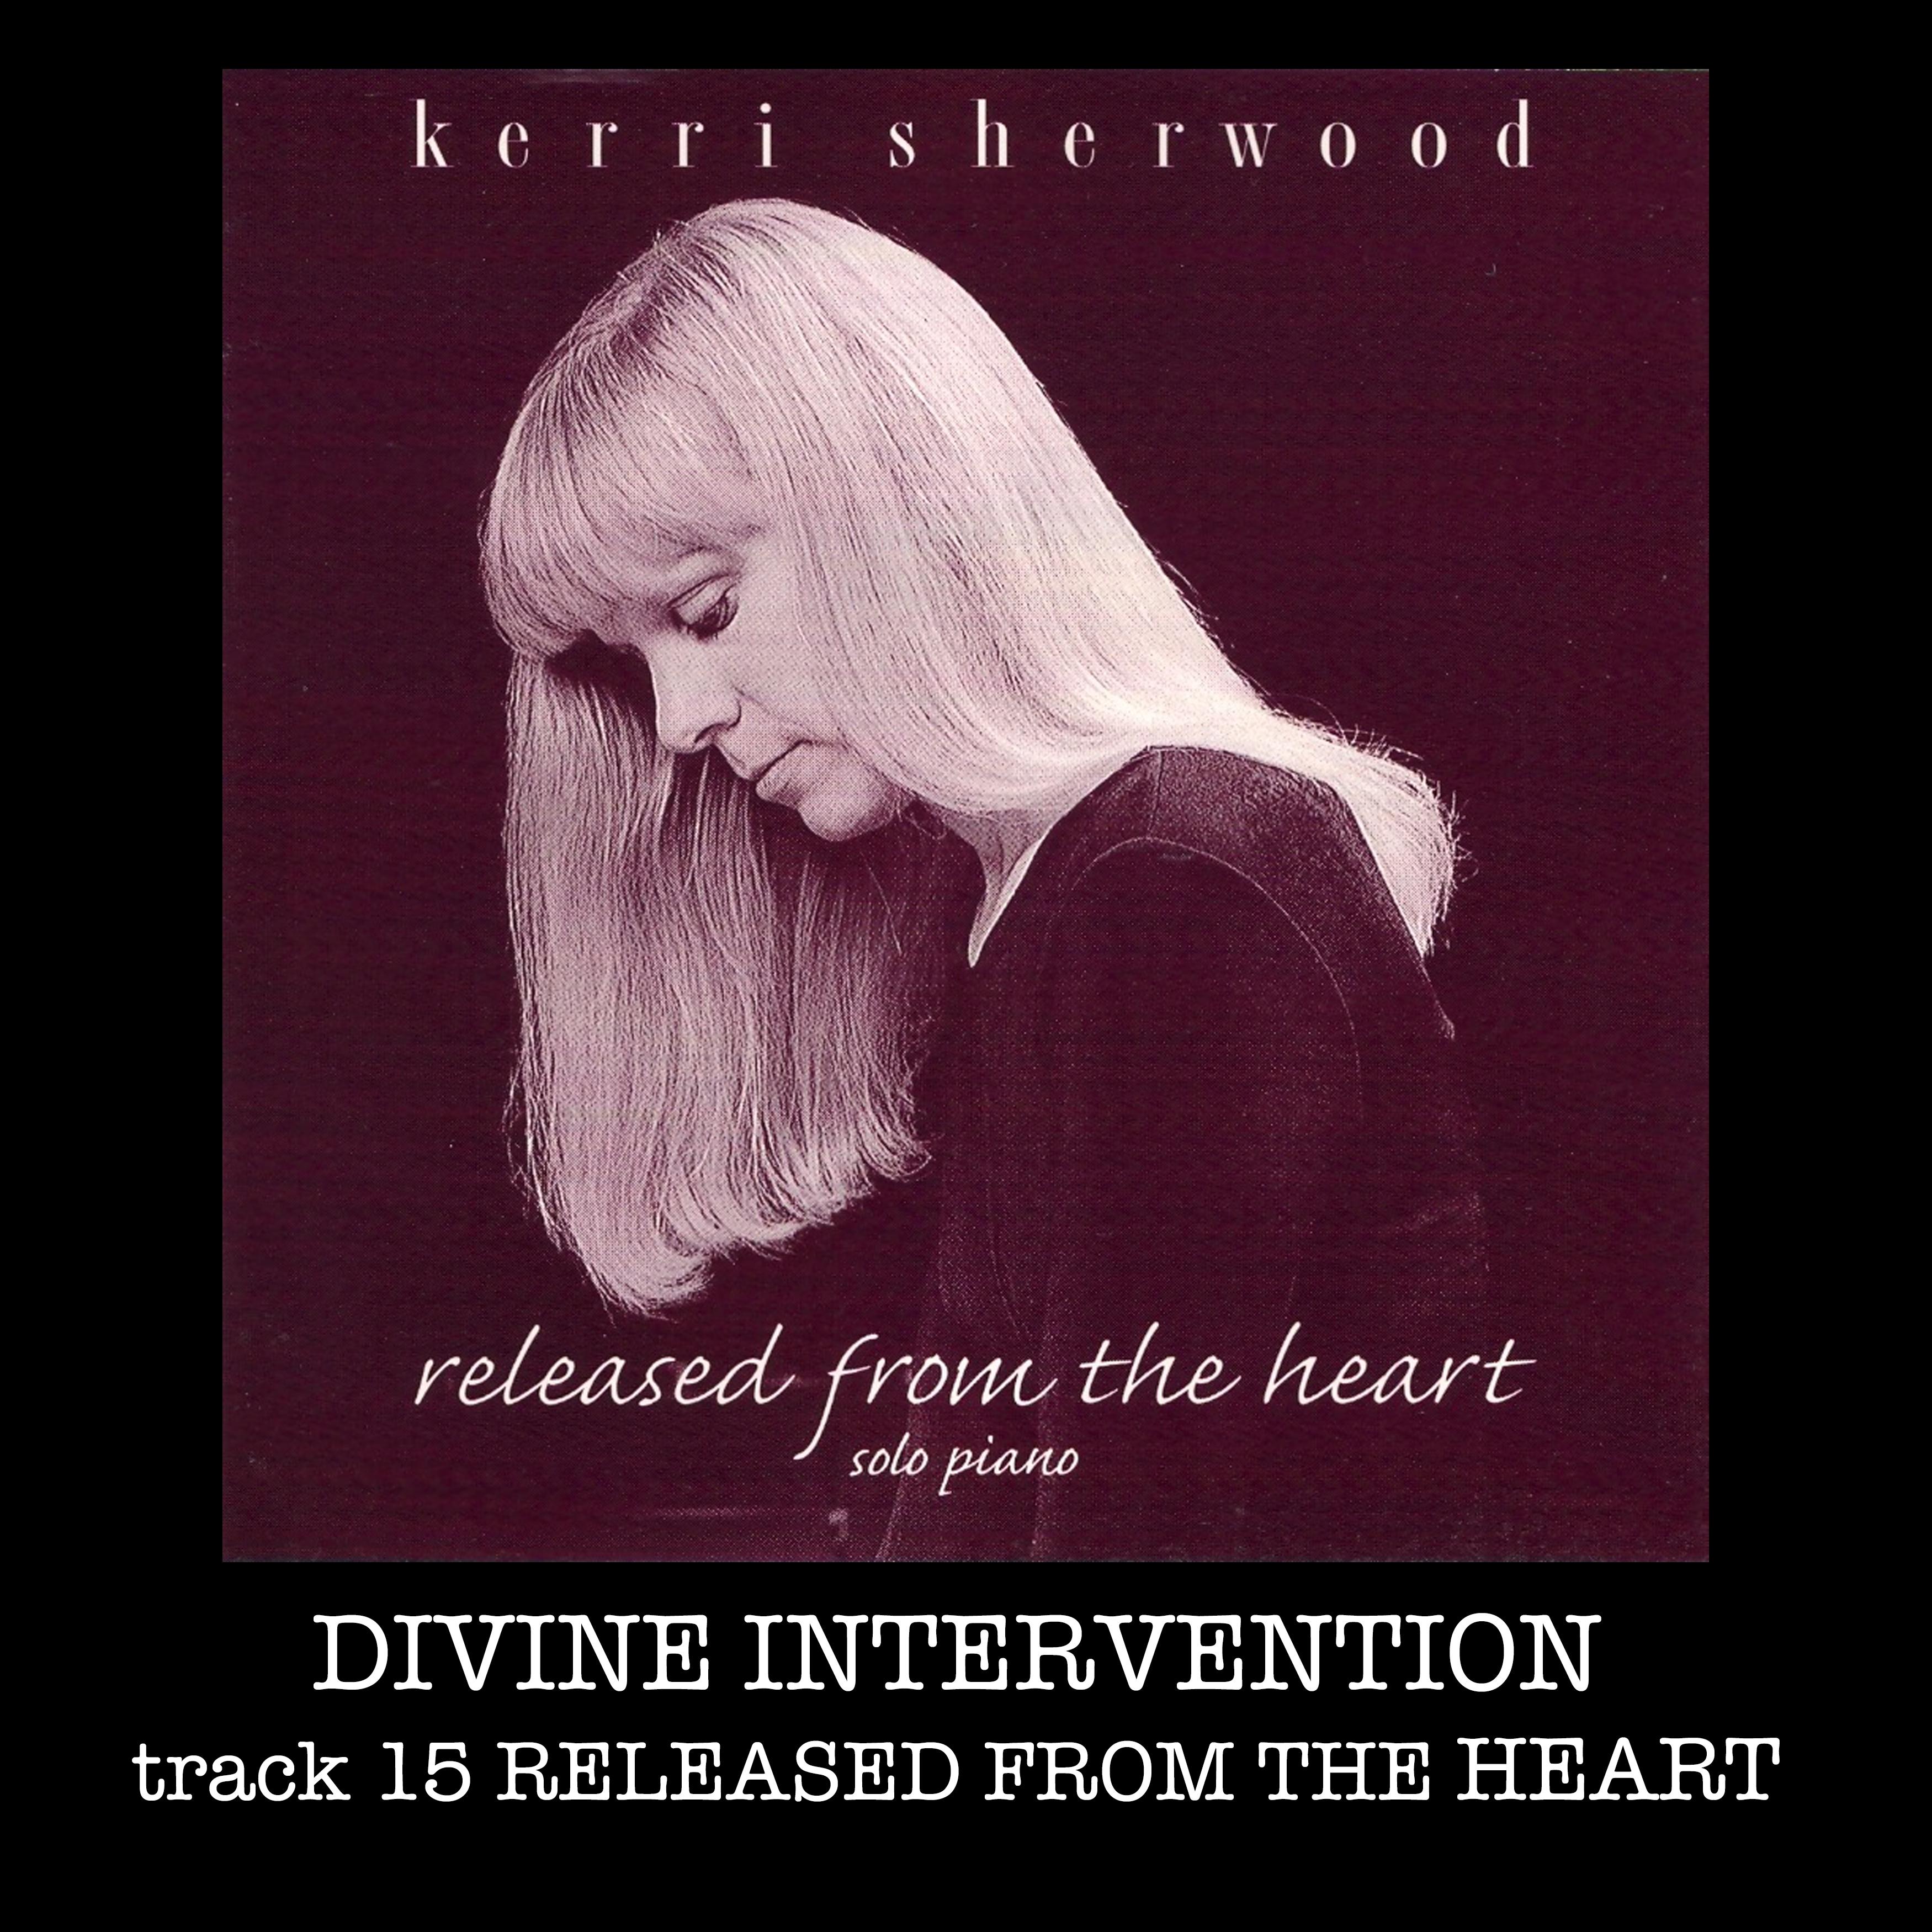 divine intervention song box.jpg